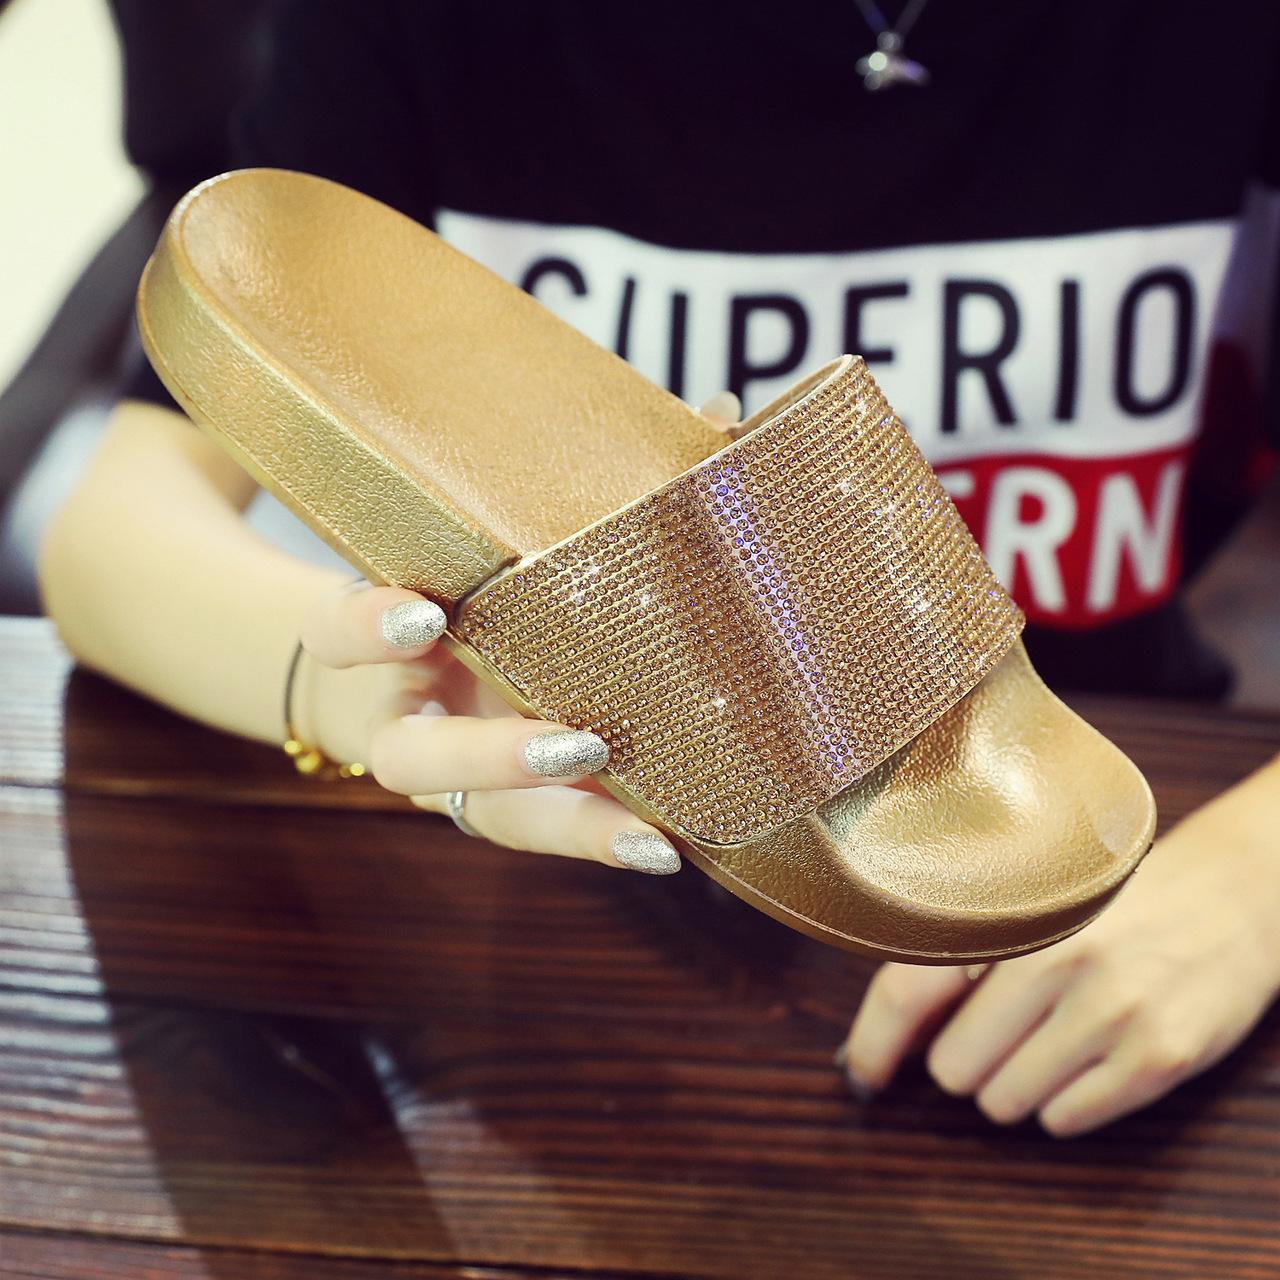 bf42de637 Women Crystal Diamond Bling Beach Slides Sandals Casual Shoes Slip ...